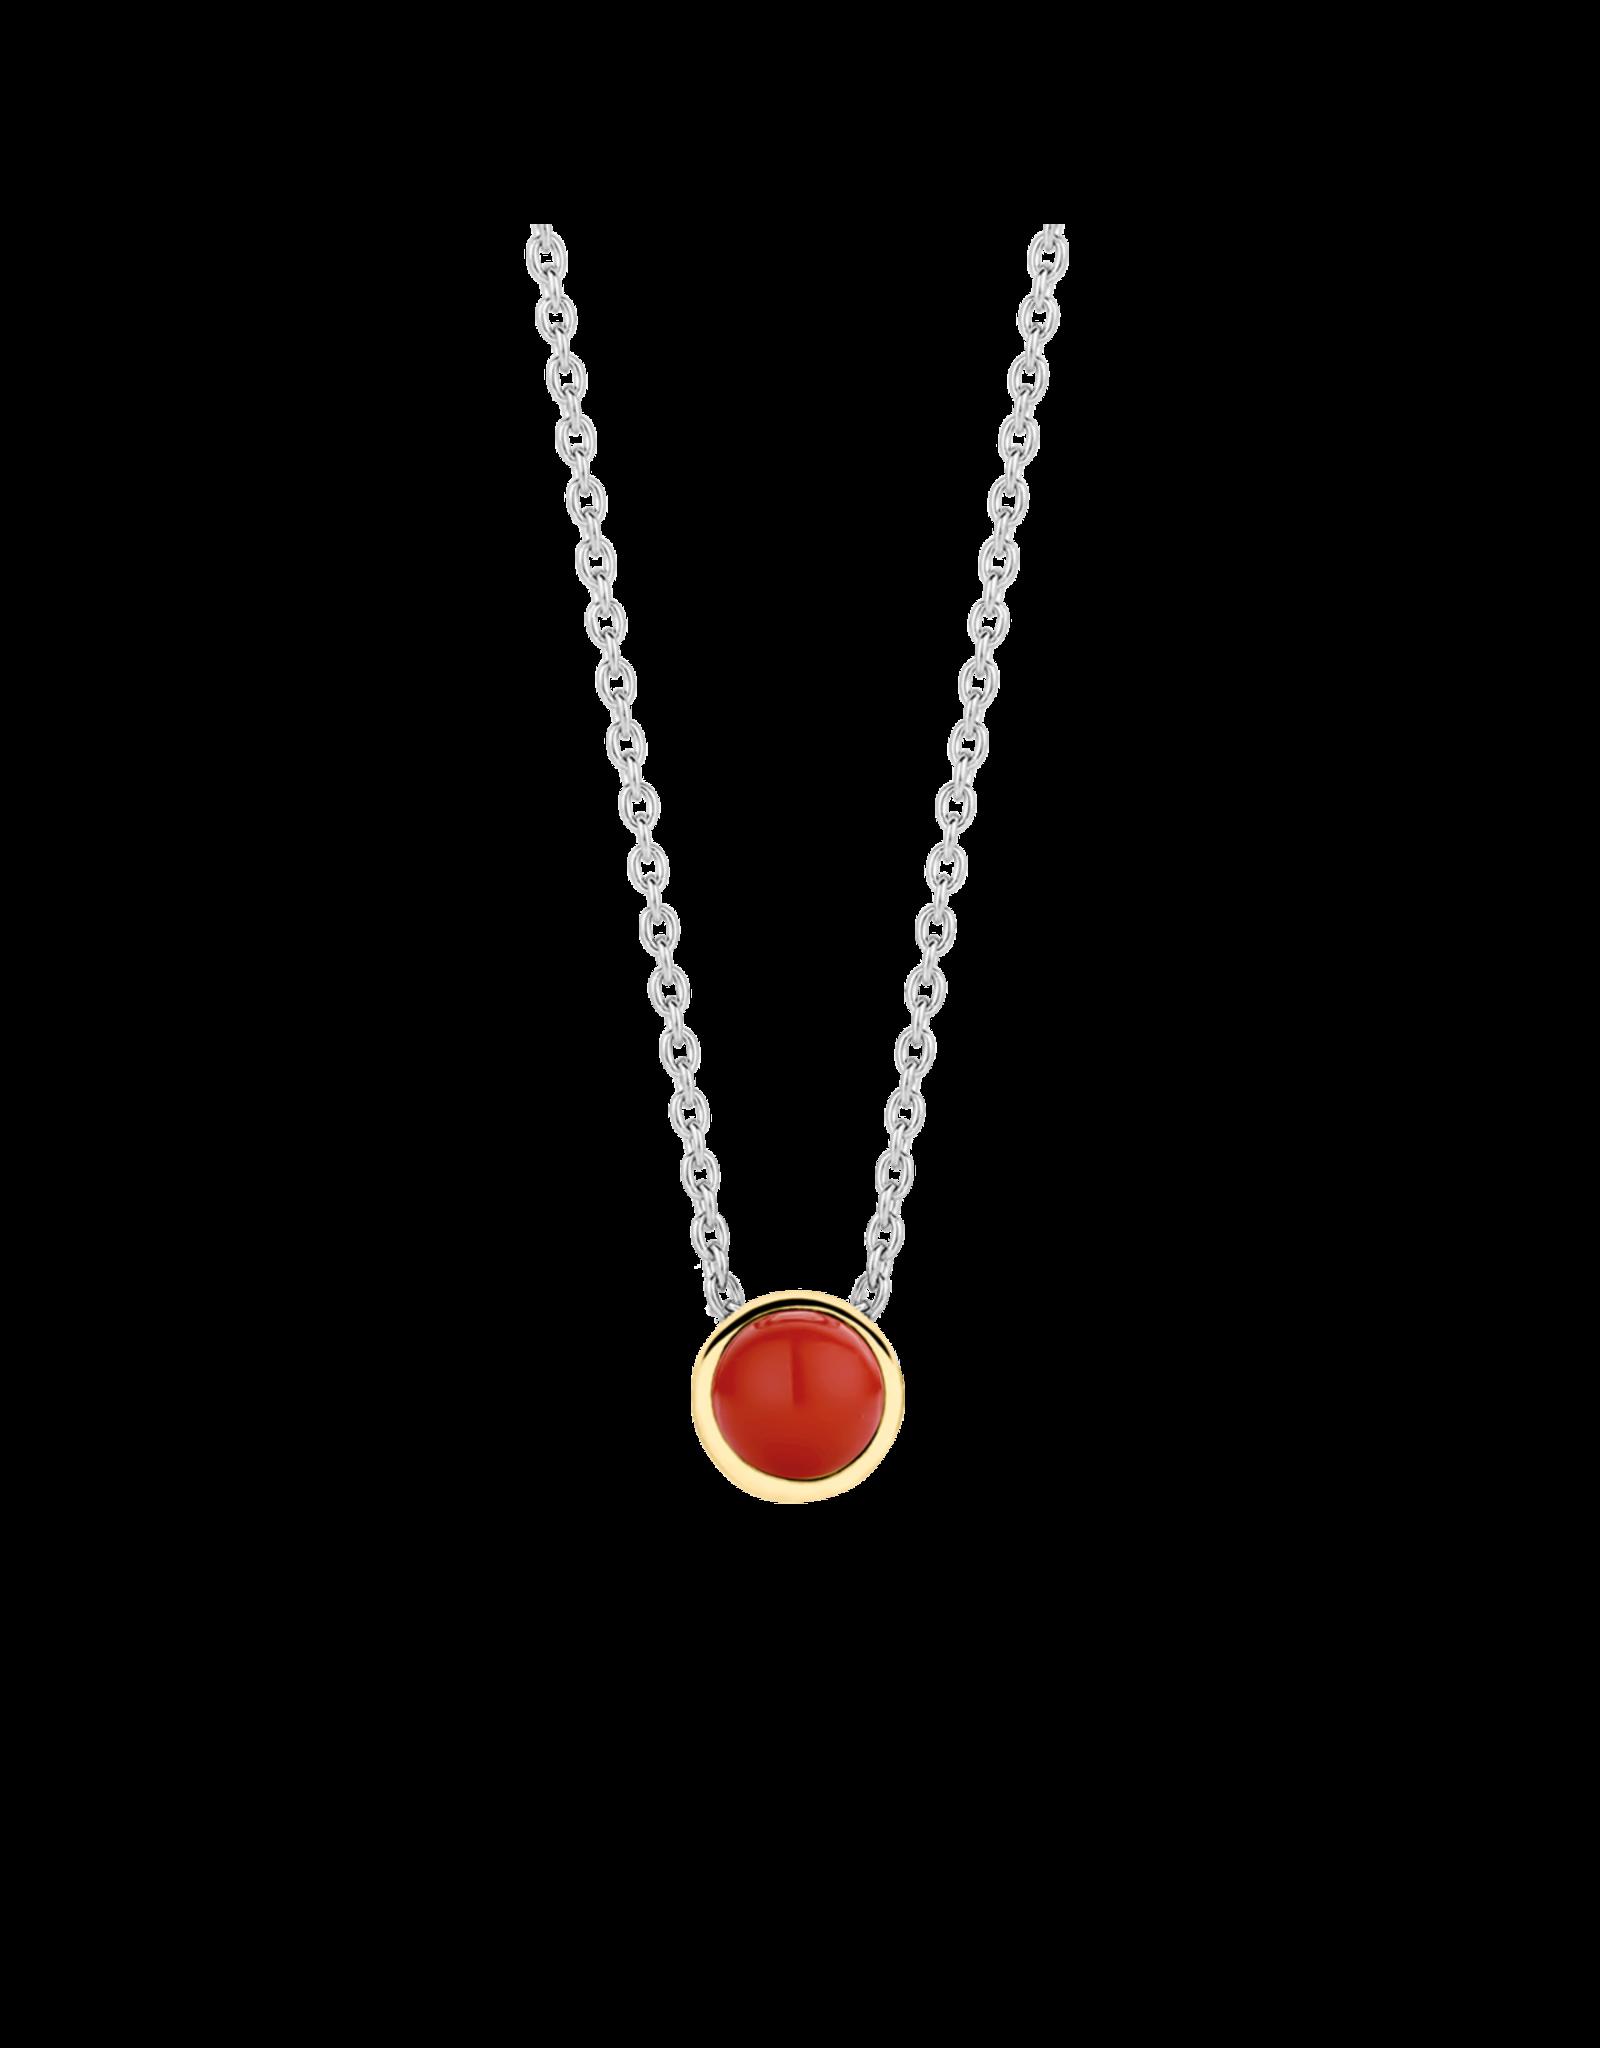 Petite Simple Coral Necklace - 3845CR